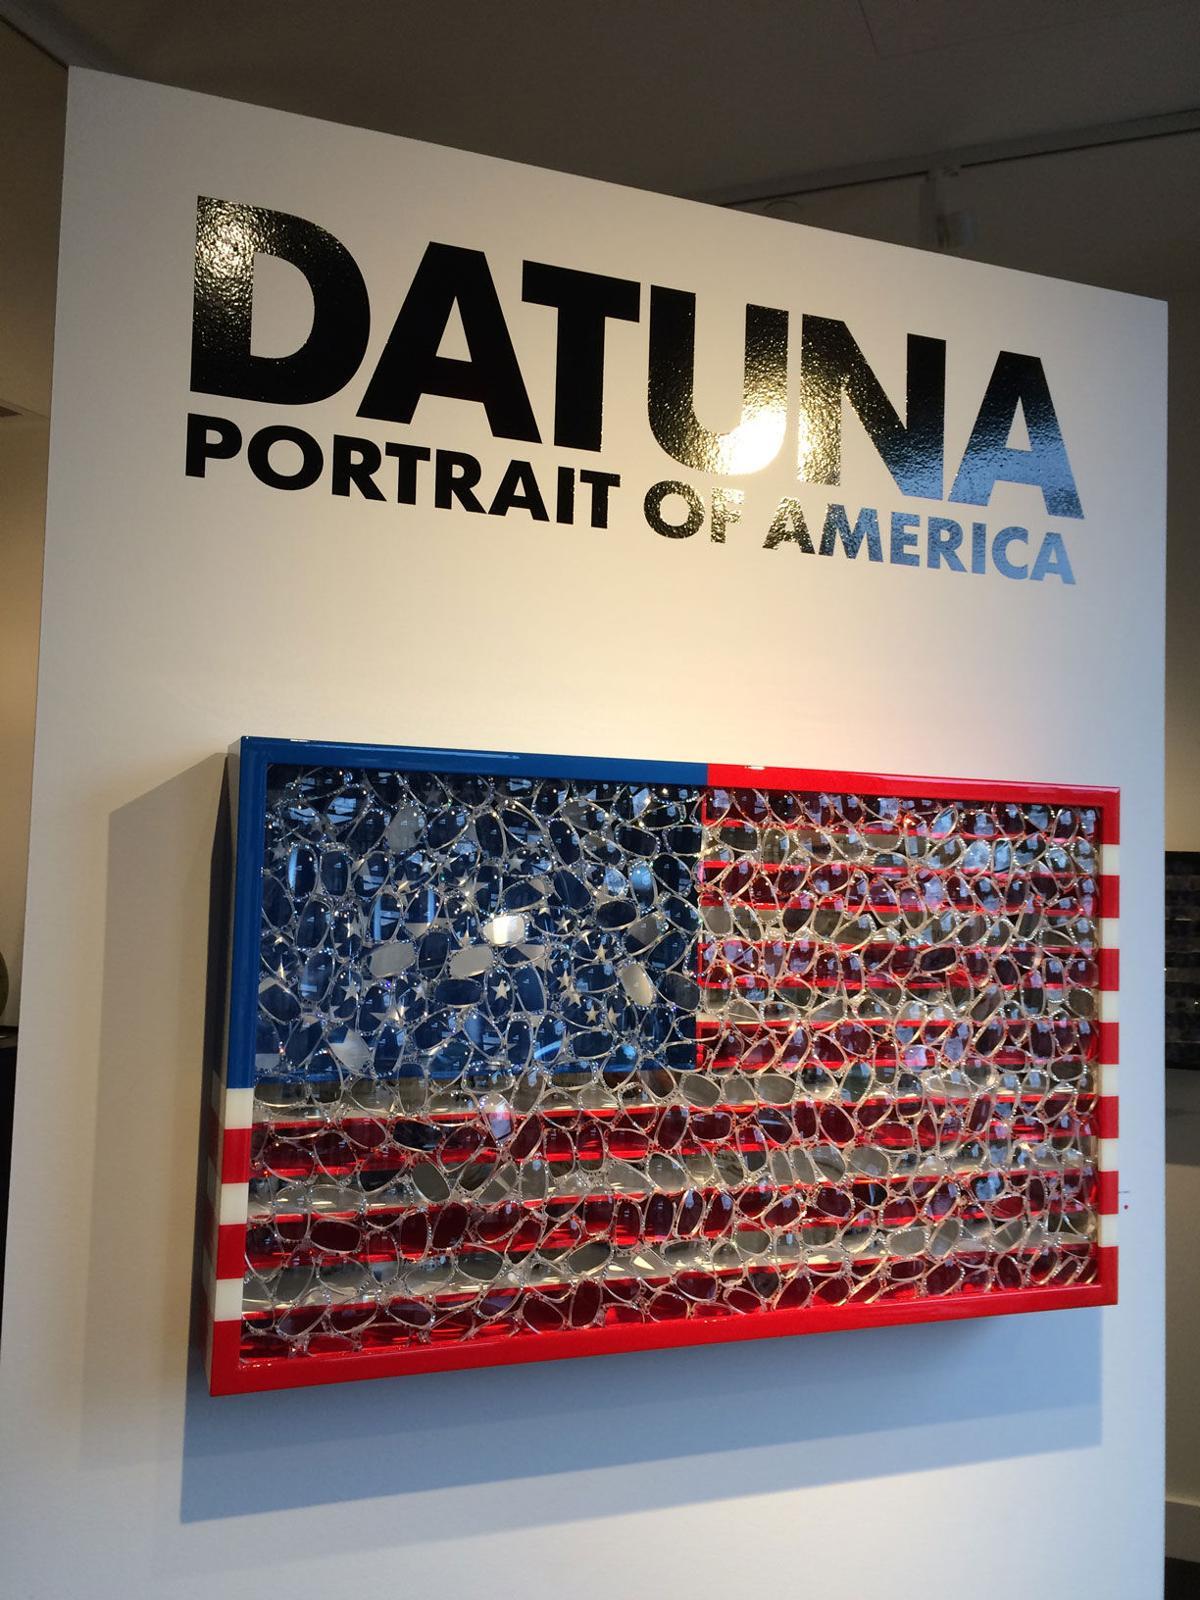 David Datuna's flag